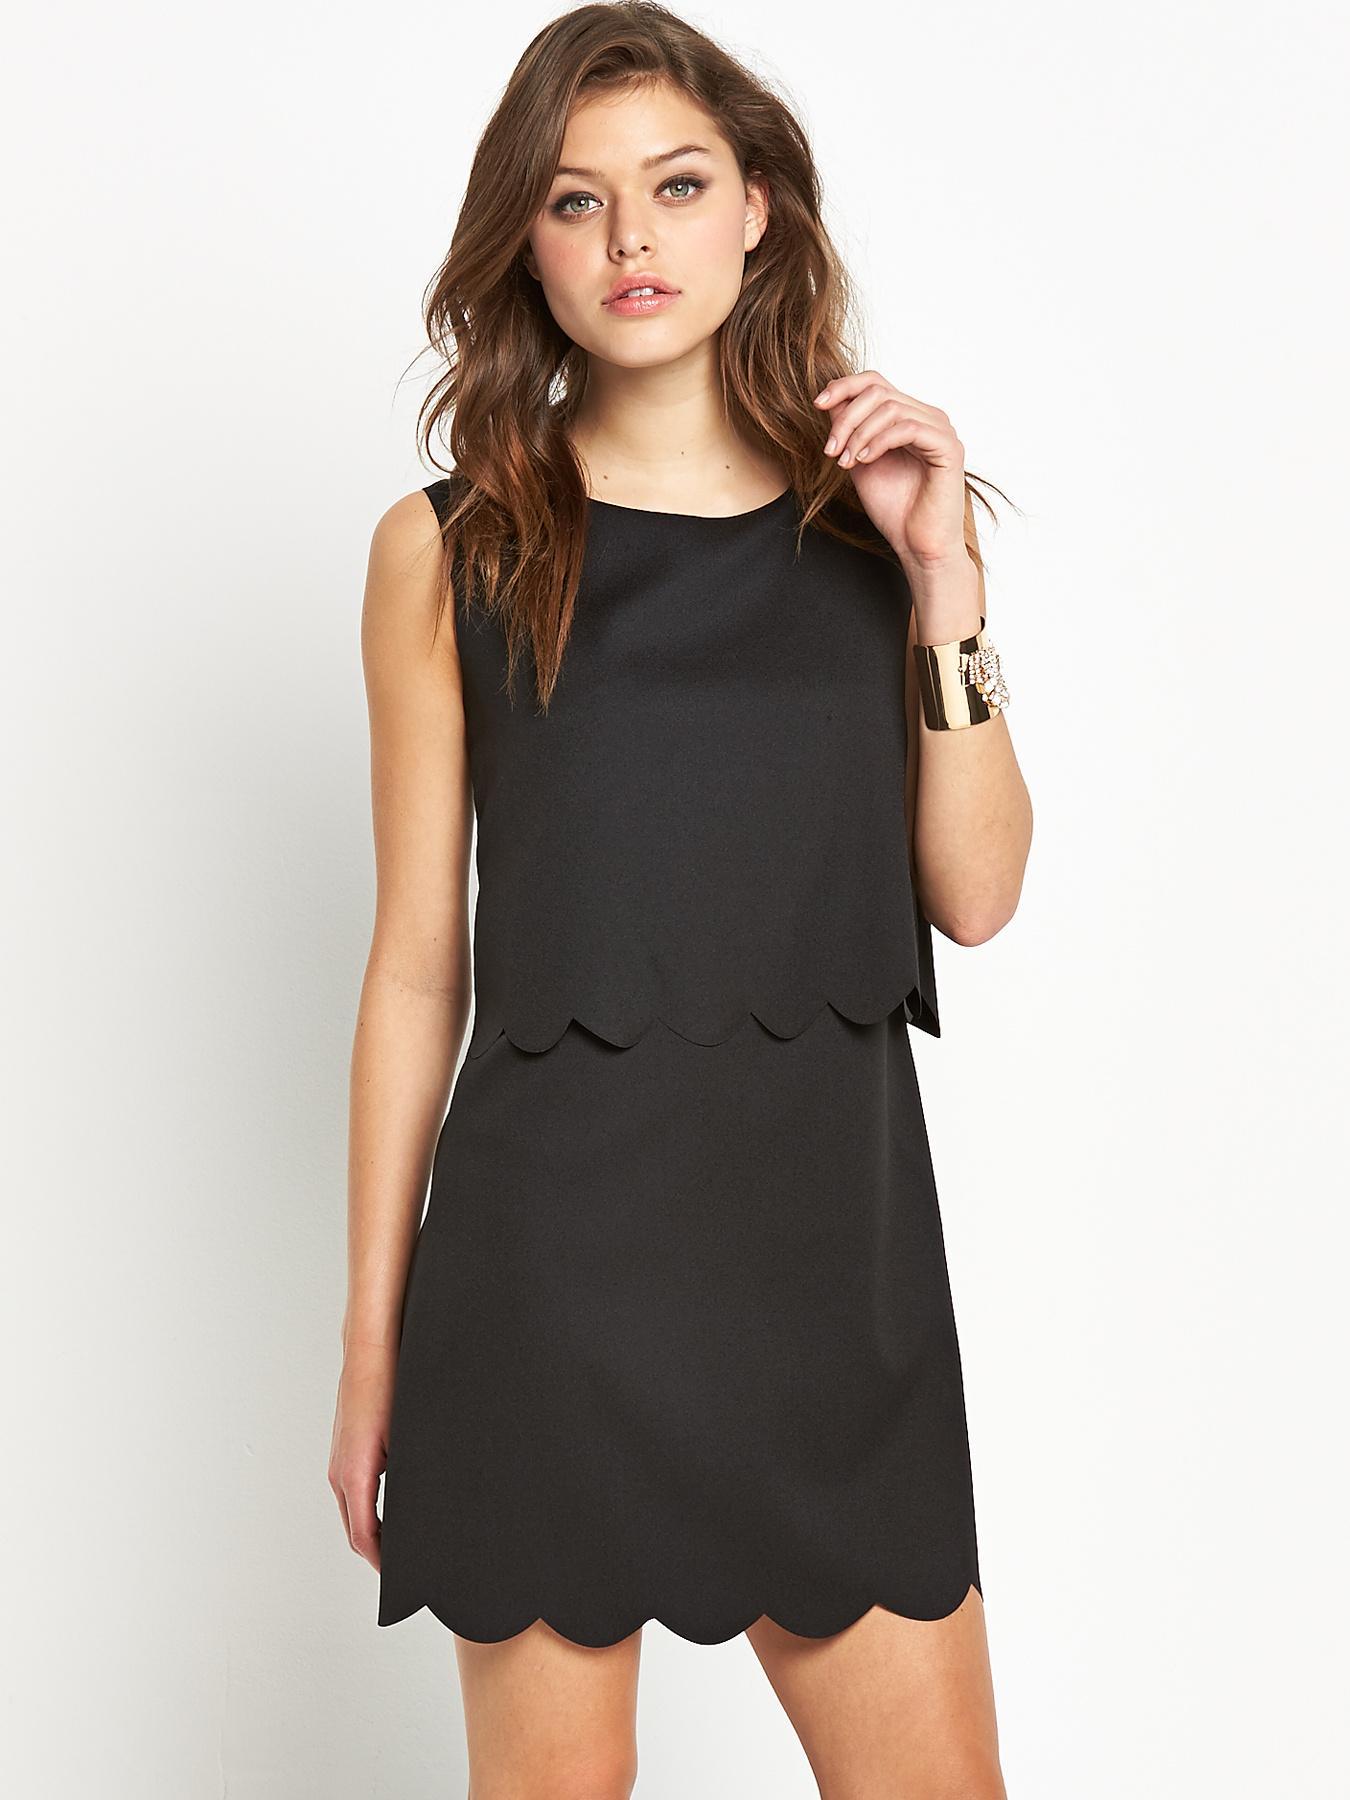 Fashion Union Scallop Dress - Black, Black